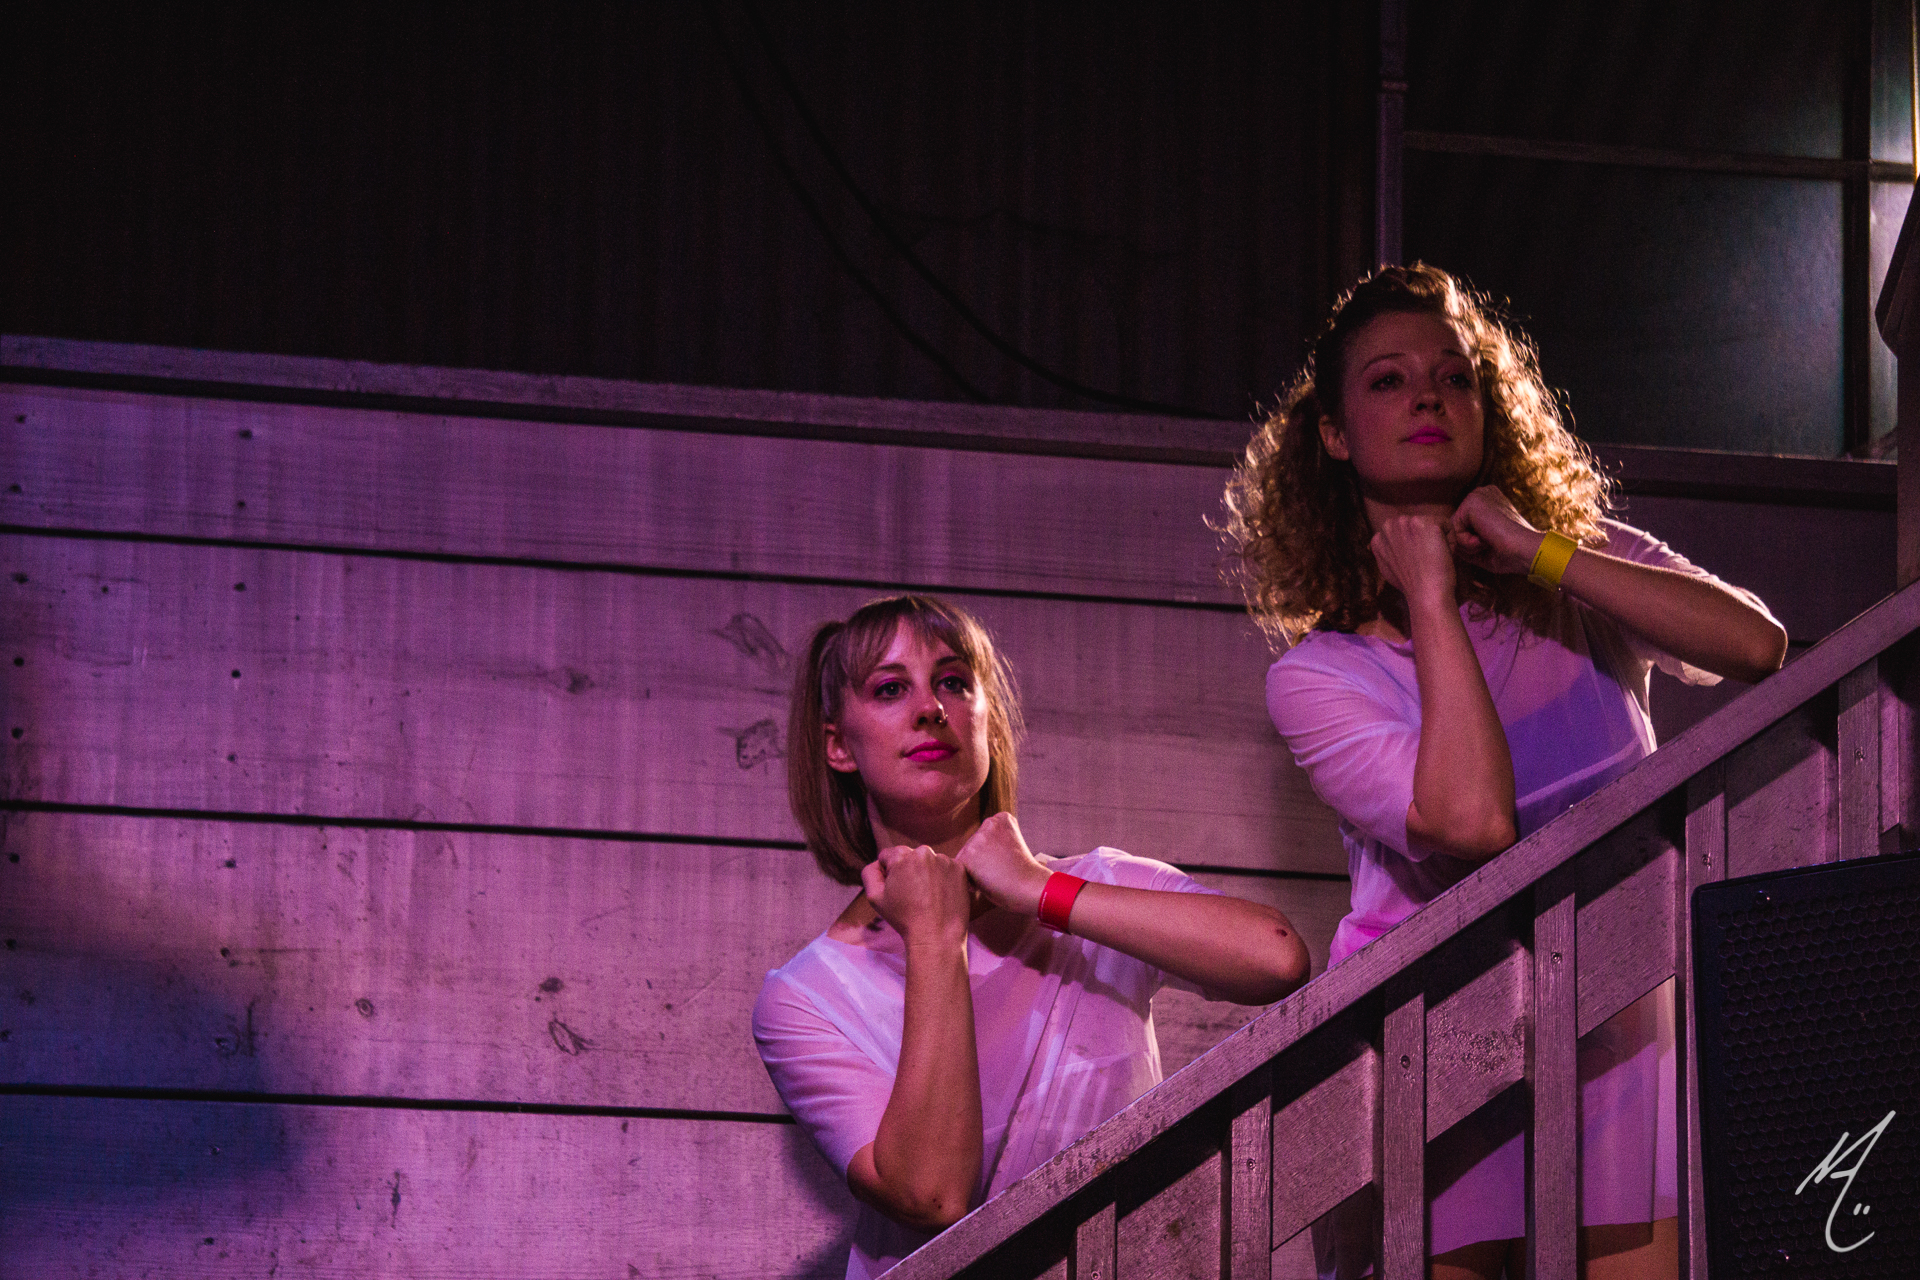 Dancers: Emily Rushing, Hailley Laurèn